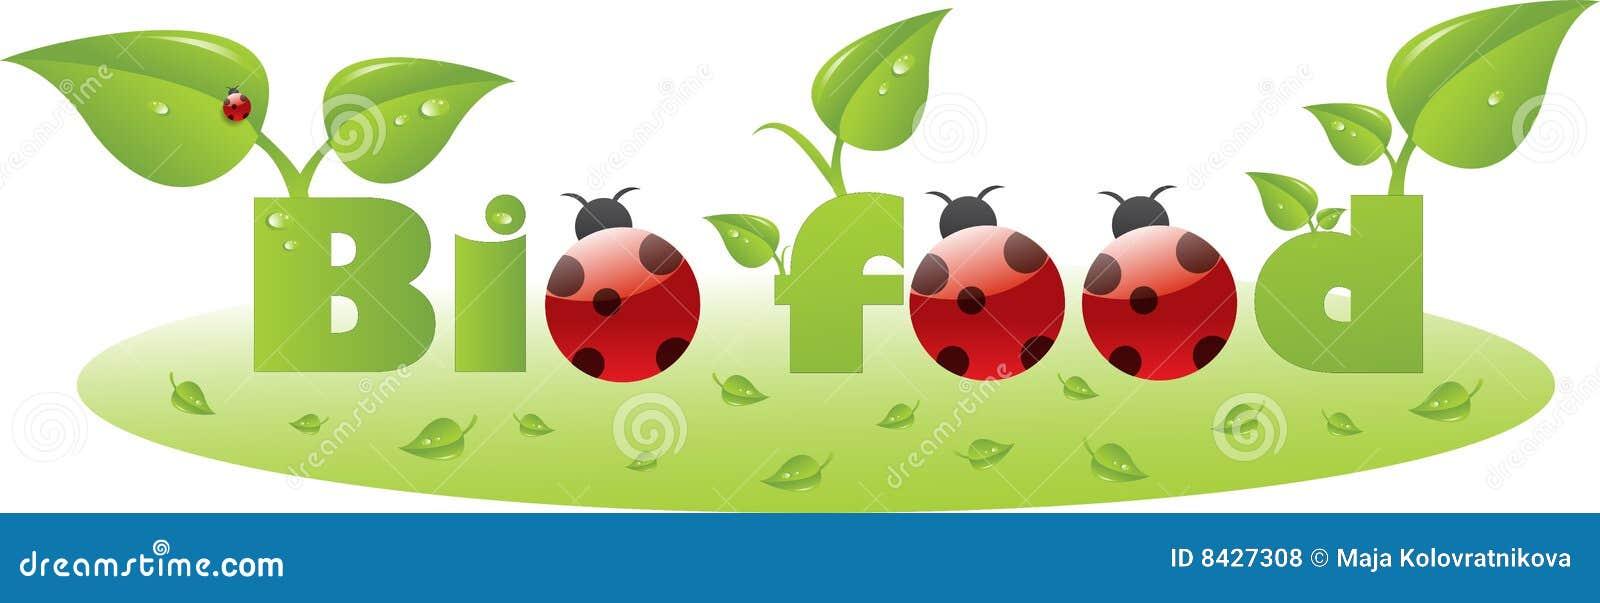 Bio food text caption with ladybugs